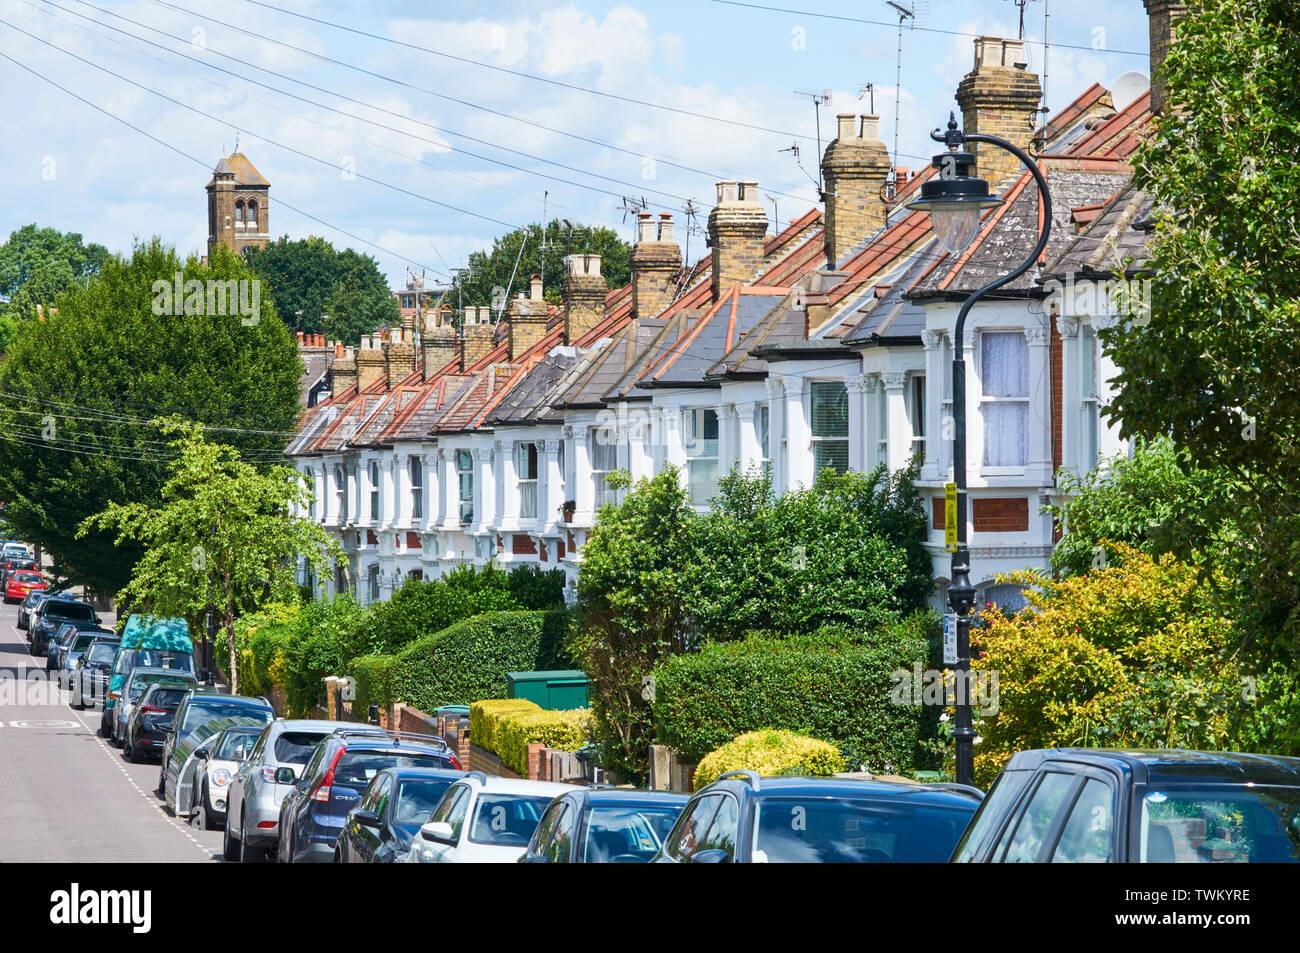 Cambio de siglo casas adosadas a lo largo de Nelson Road, Crouch End, Londres, Reino Unido Imagen De Stock